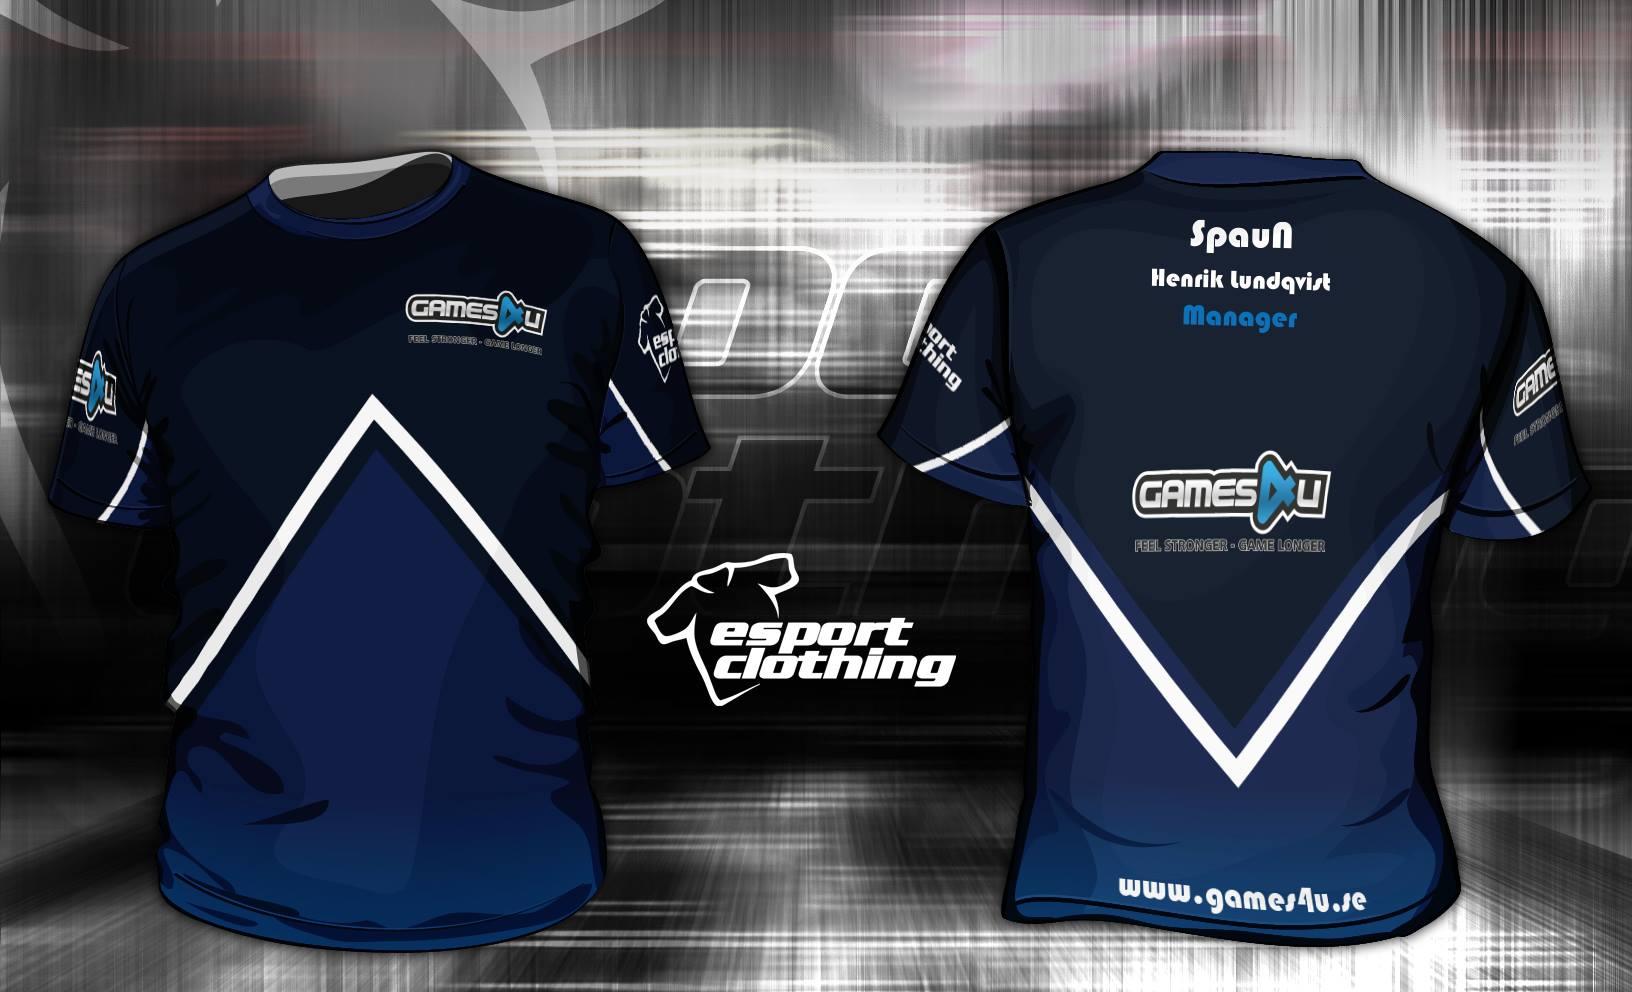 Games4u - Athlete Short Sleeve Jersey